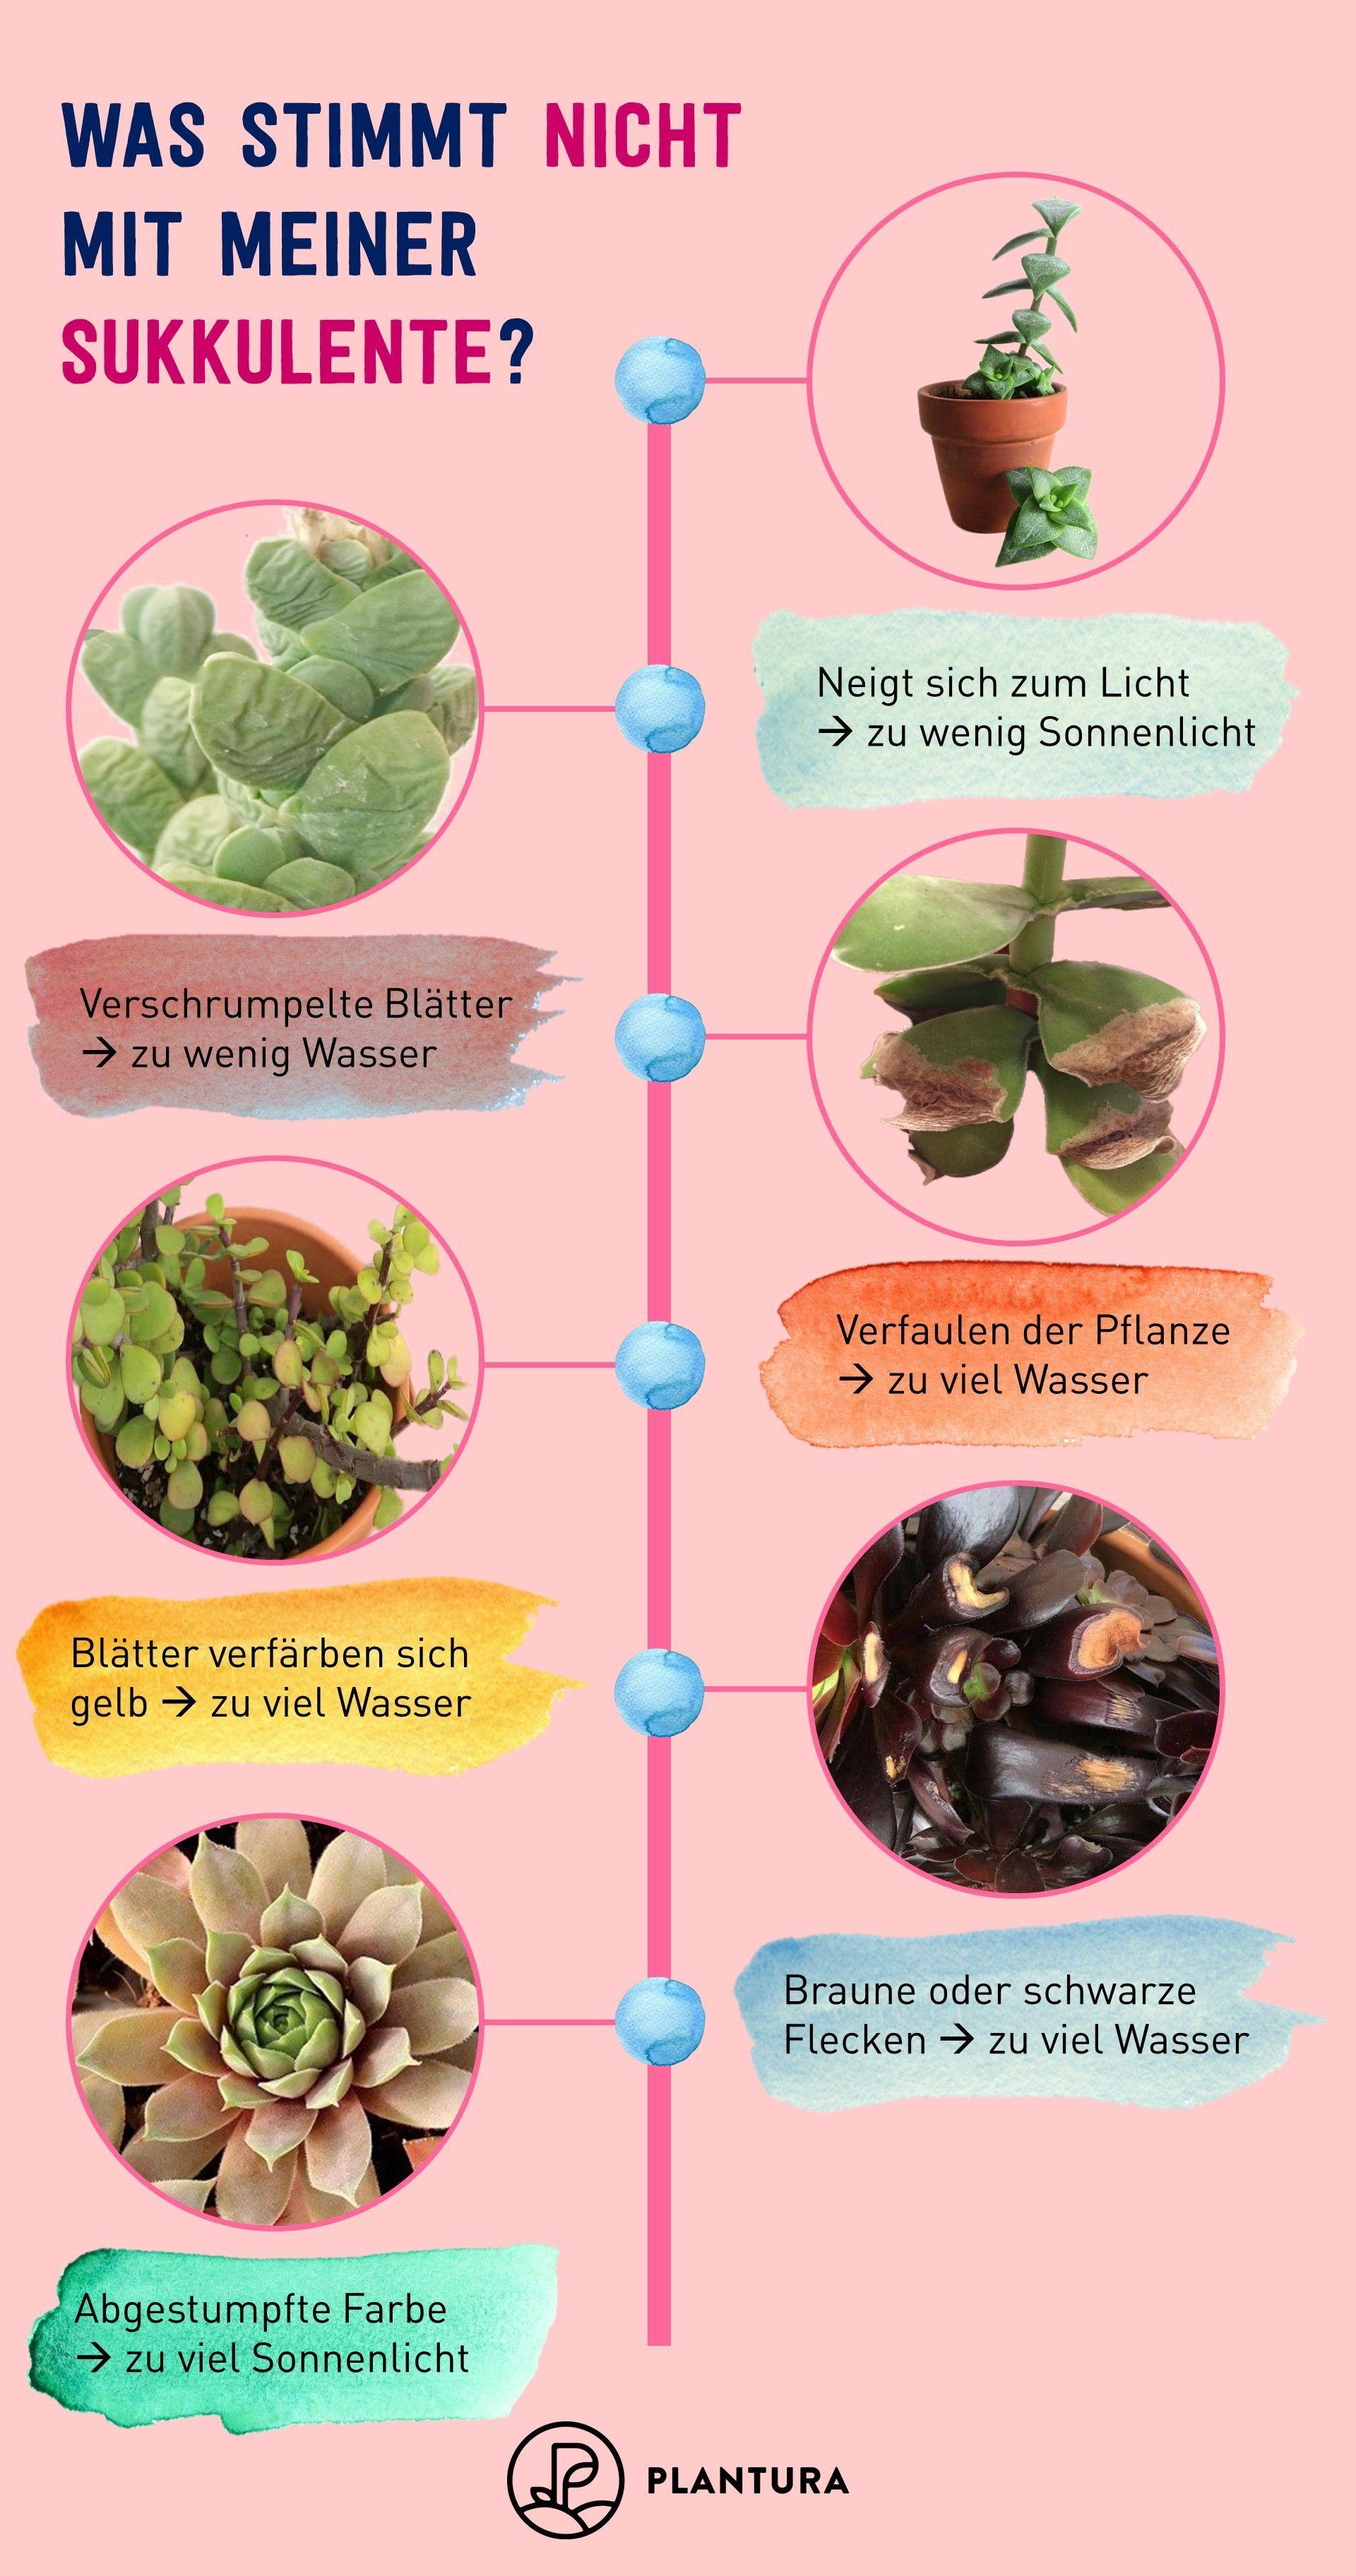 Kakteen & Sukkulenten richtig pflegen: Die 5 besten Tipps - Plantura